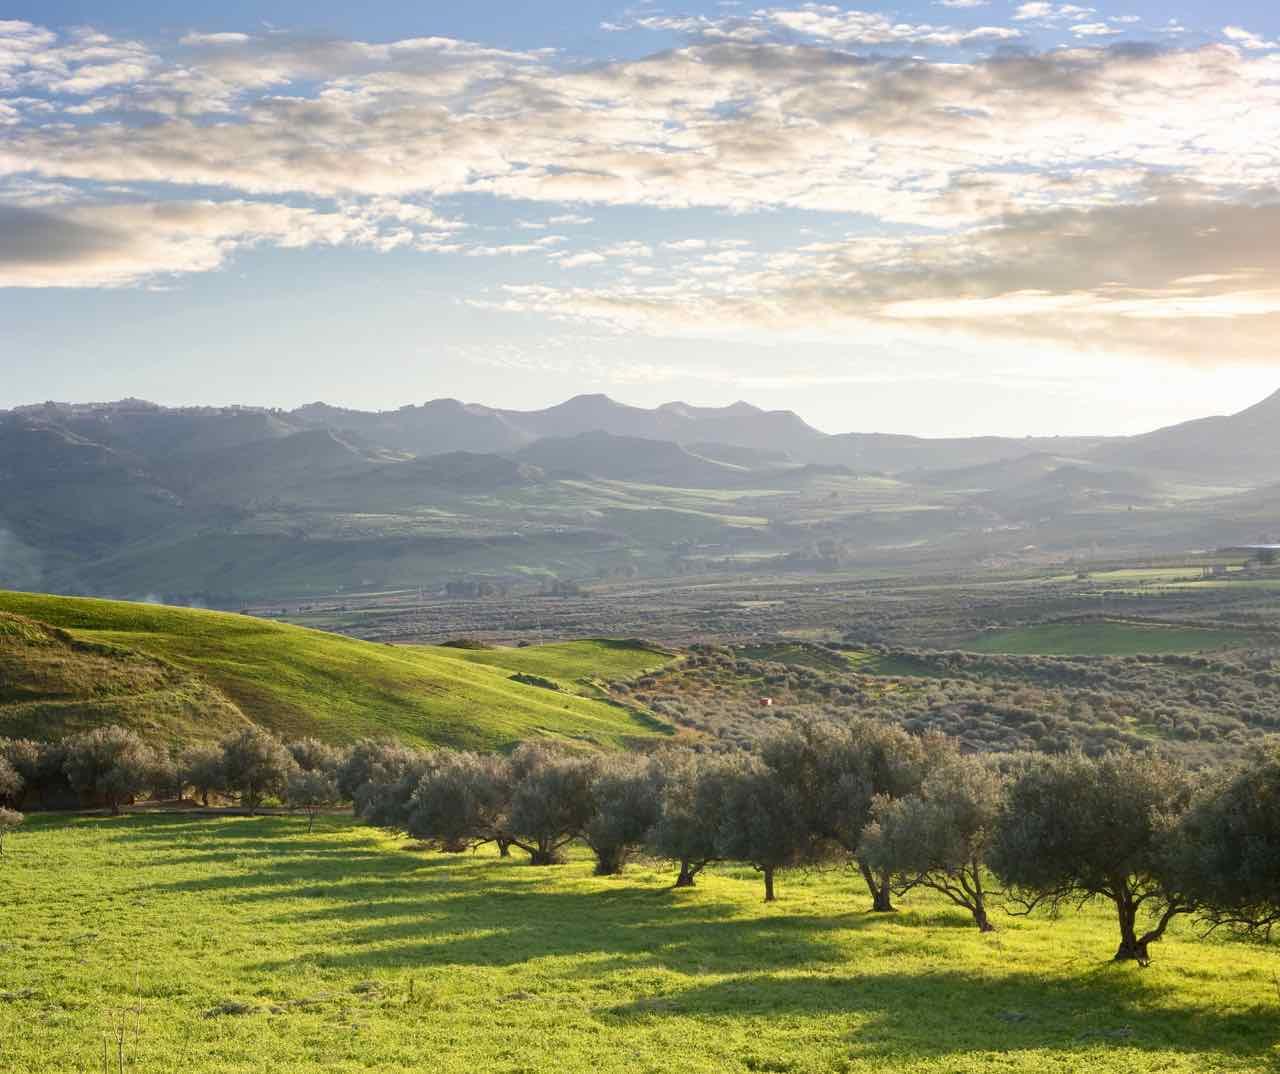 olio extravergine di oliva siciliano -evo oil from Sicily - Gustorotondo Italian food boutique - I migliori cibi online - Best Italian foods online - spesa online